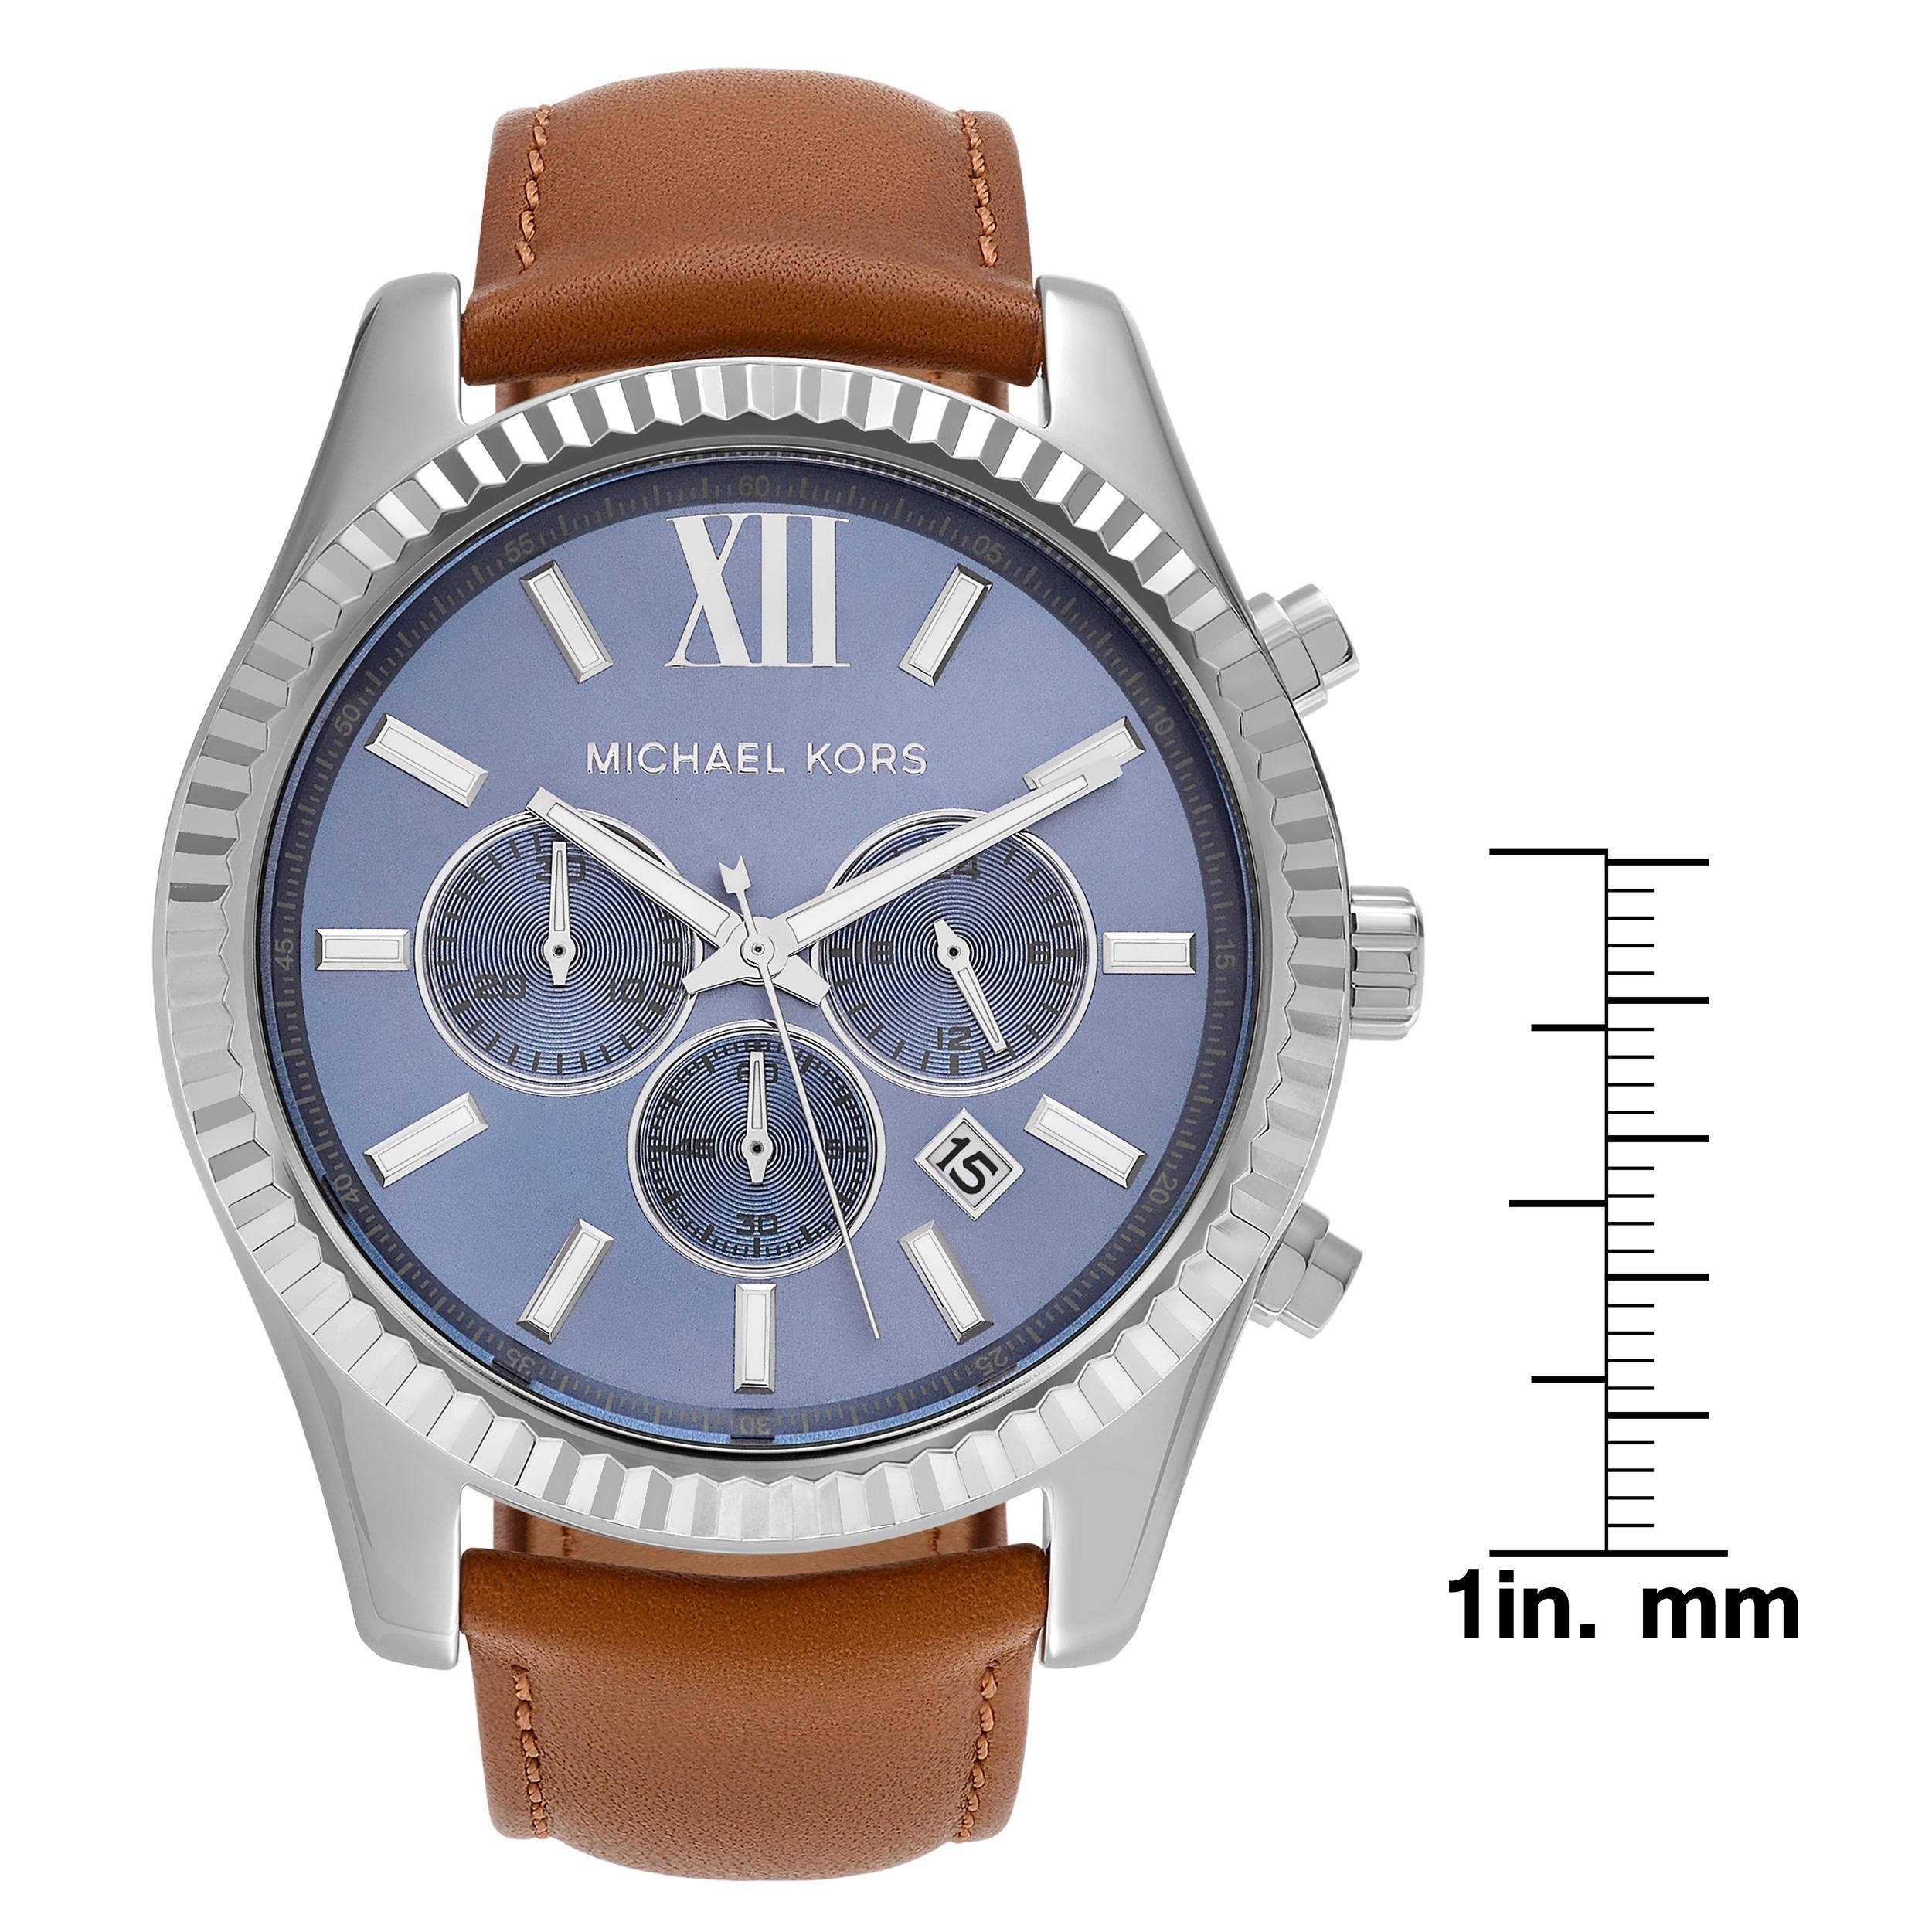 12588a57e Michael Kors Men's 'Lexington' MK8537 Stainless Steel Blue Chronograph Dial Leather  Strap Watch - Brown